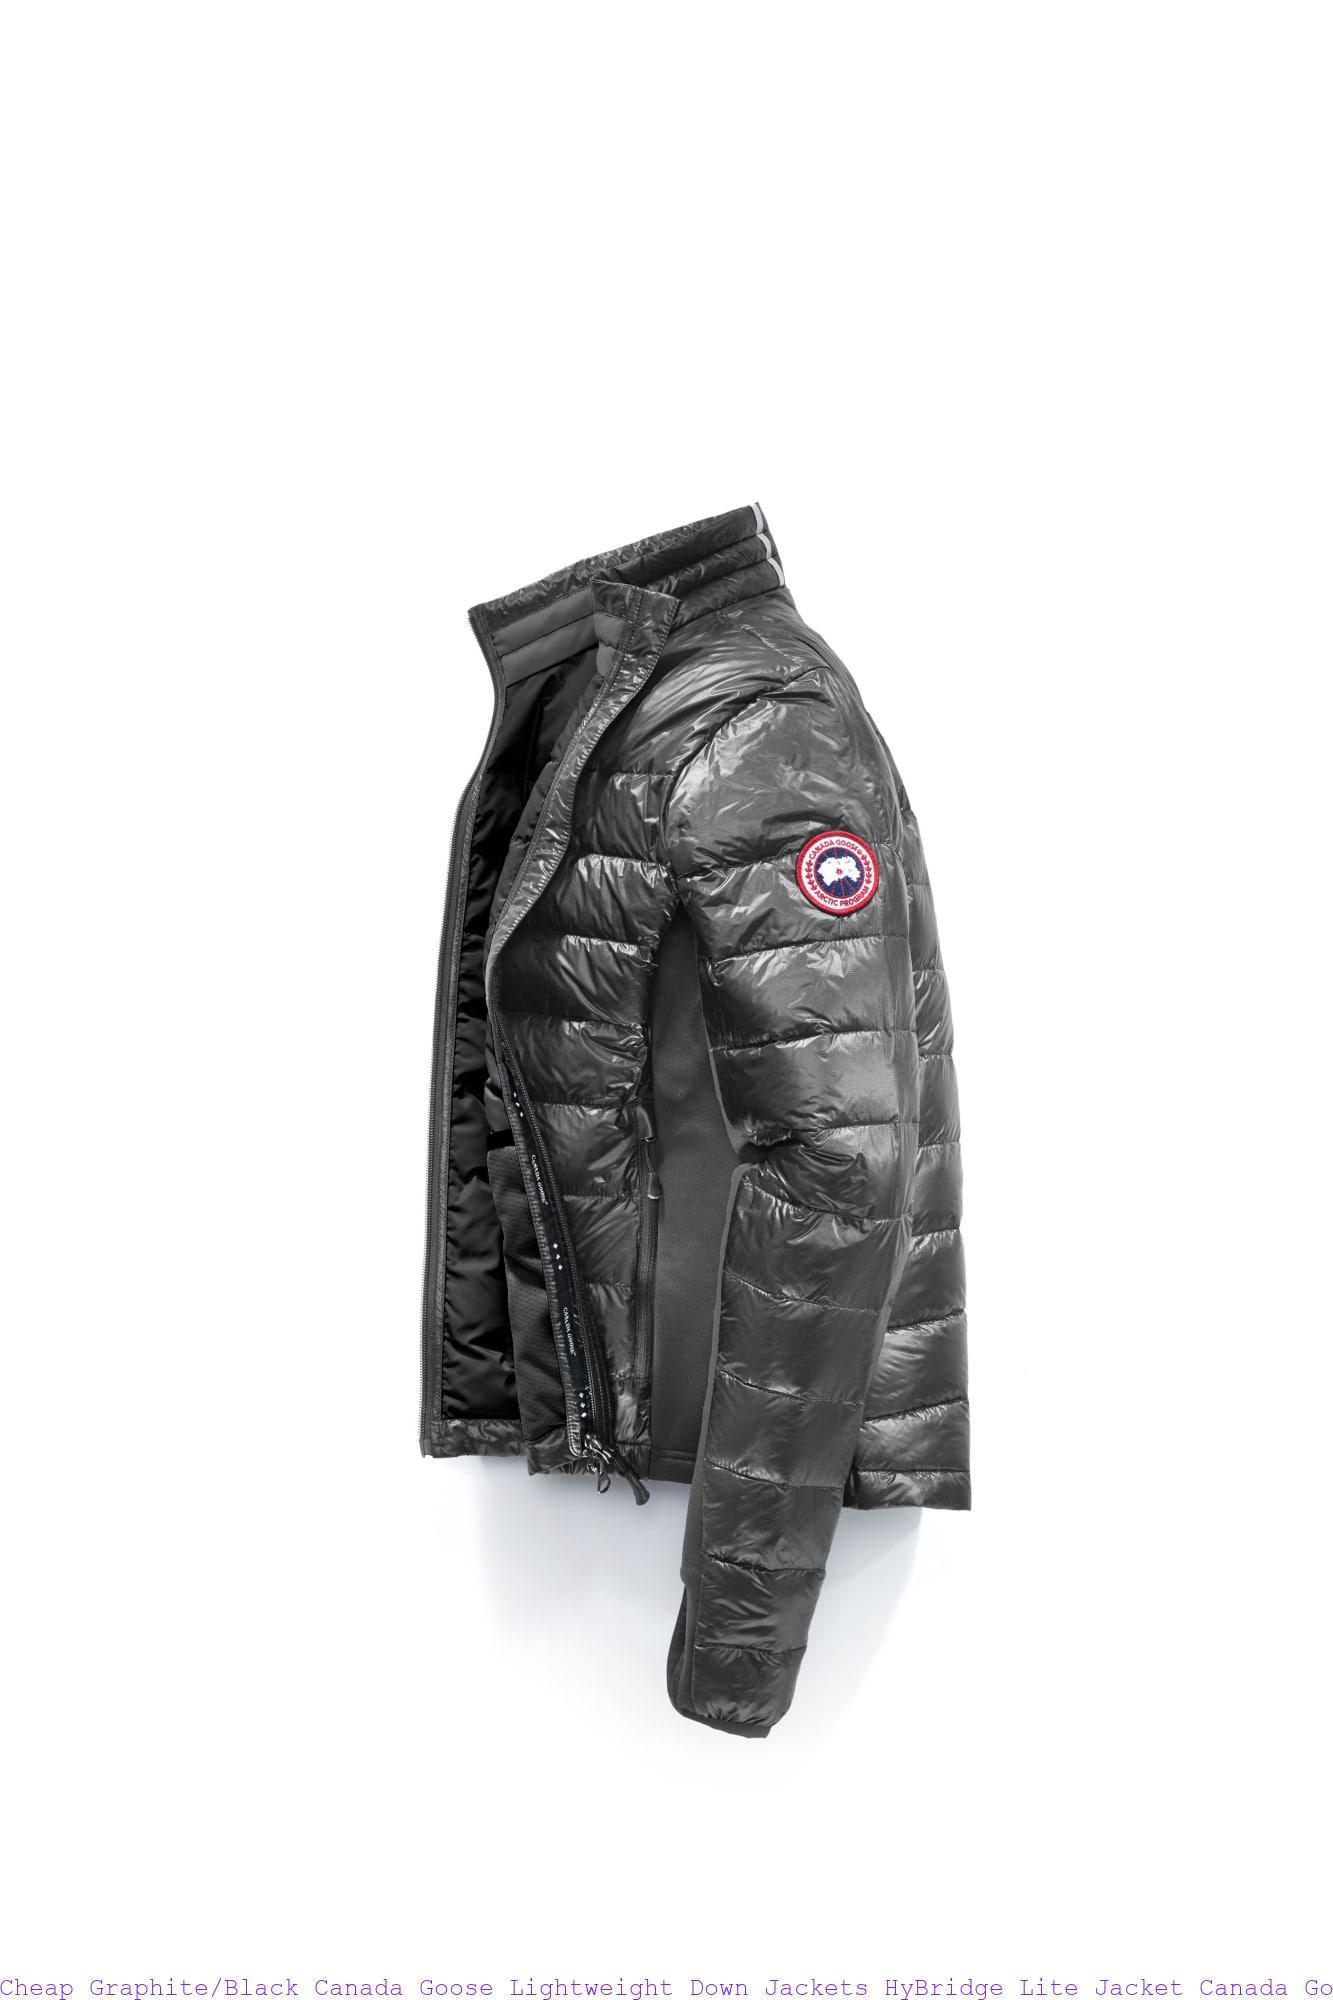 1f57db2d35d Cheap Graphite/Black Canada Goose Lightweight Down Jackets HyBridge Lite  Jacket Canada Goose Outlet Parka 2701L